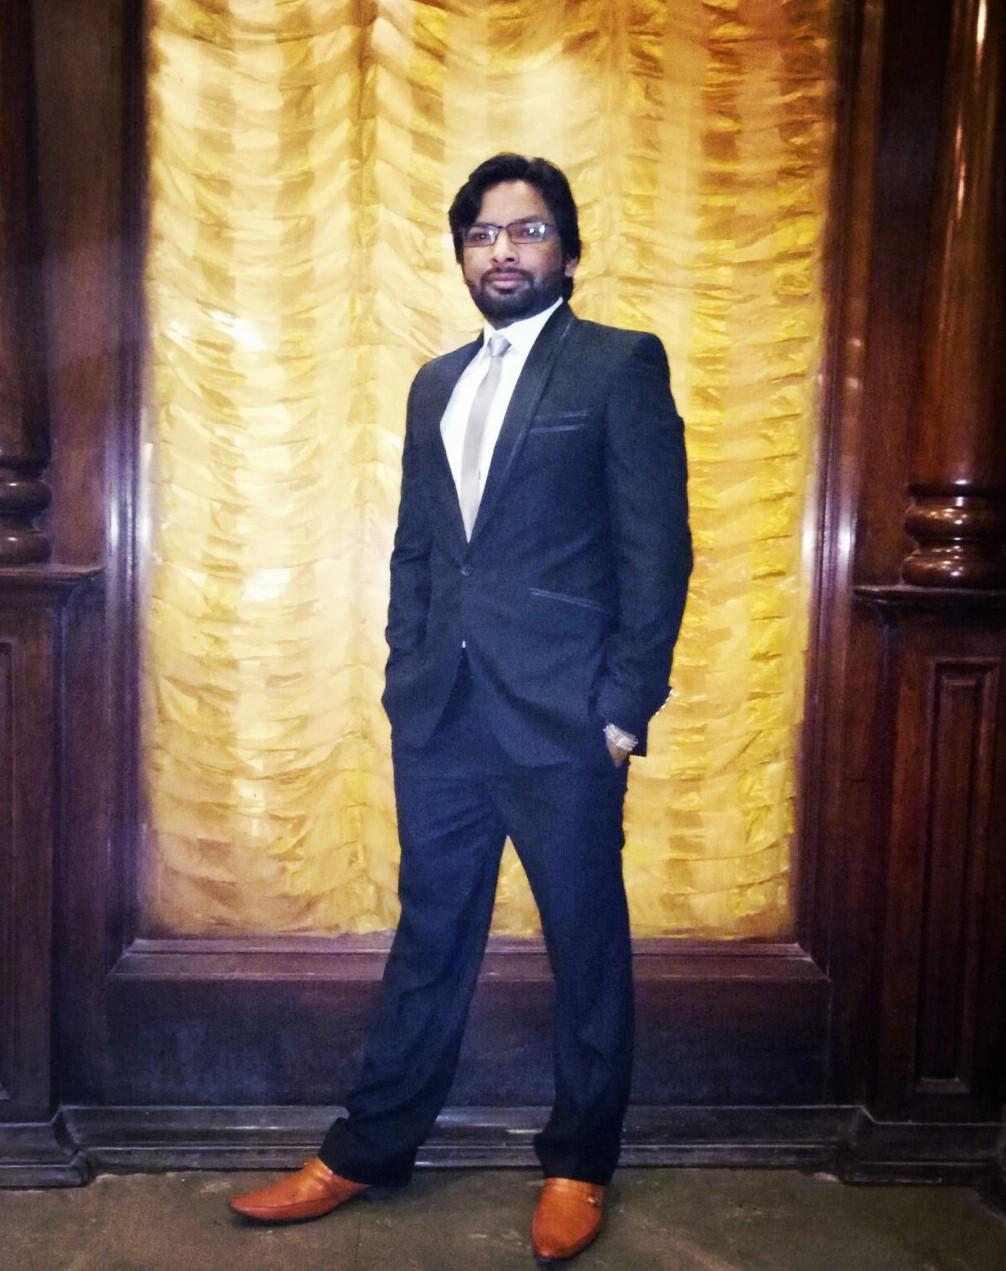 Kamran Taj Taj Shaheen Masih Word, Management, Data Entry